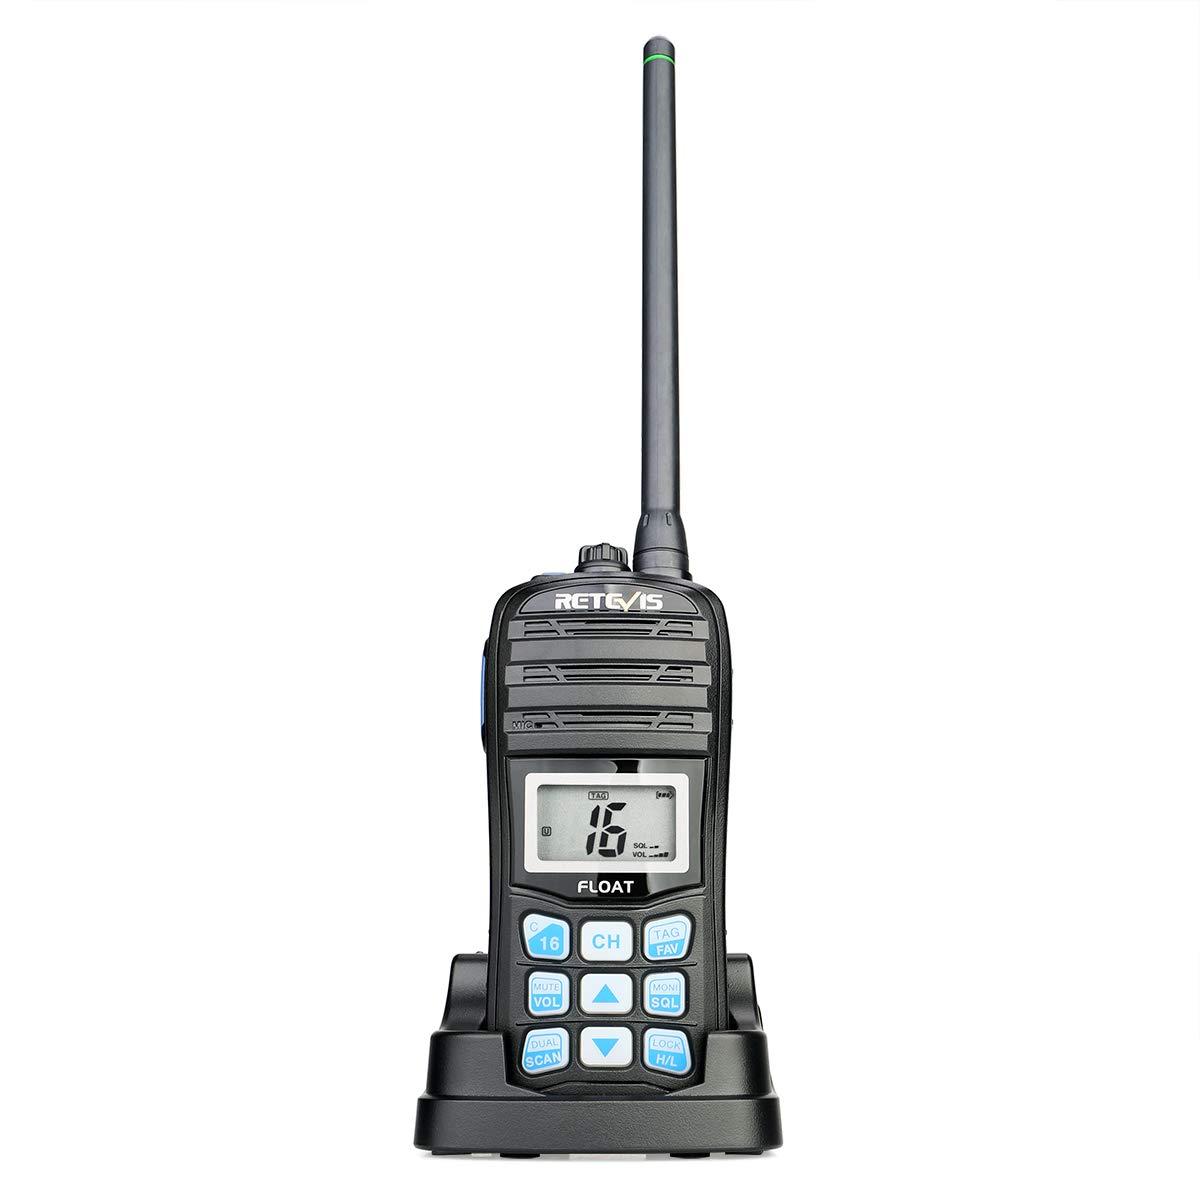 Retevis RT55 Marine Radio Floating Long Range Waterproof Handheld VHF Radio with NOAA Weather Alert and Vibration Water Draining Function(1 Pack) by Retevis